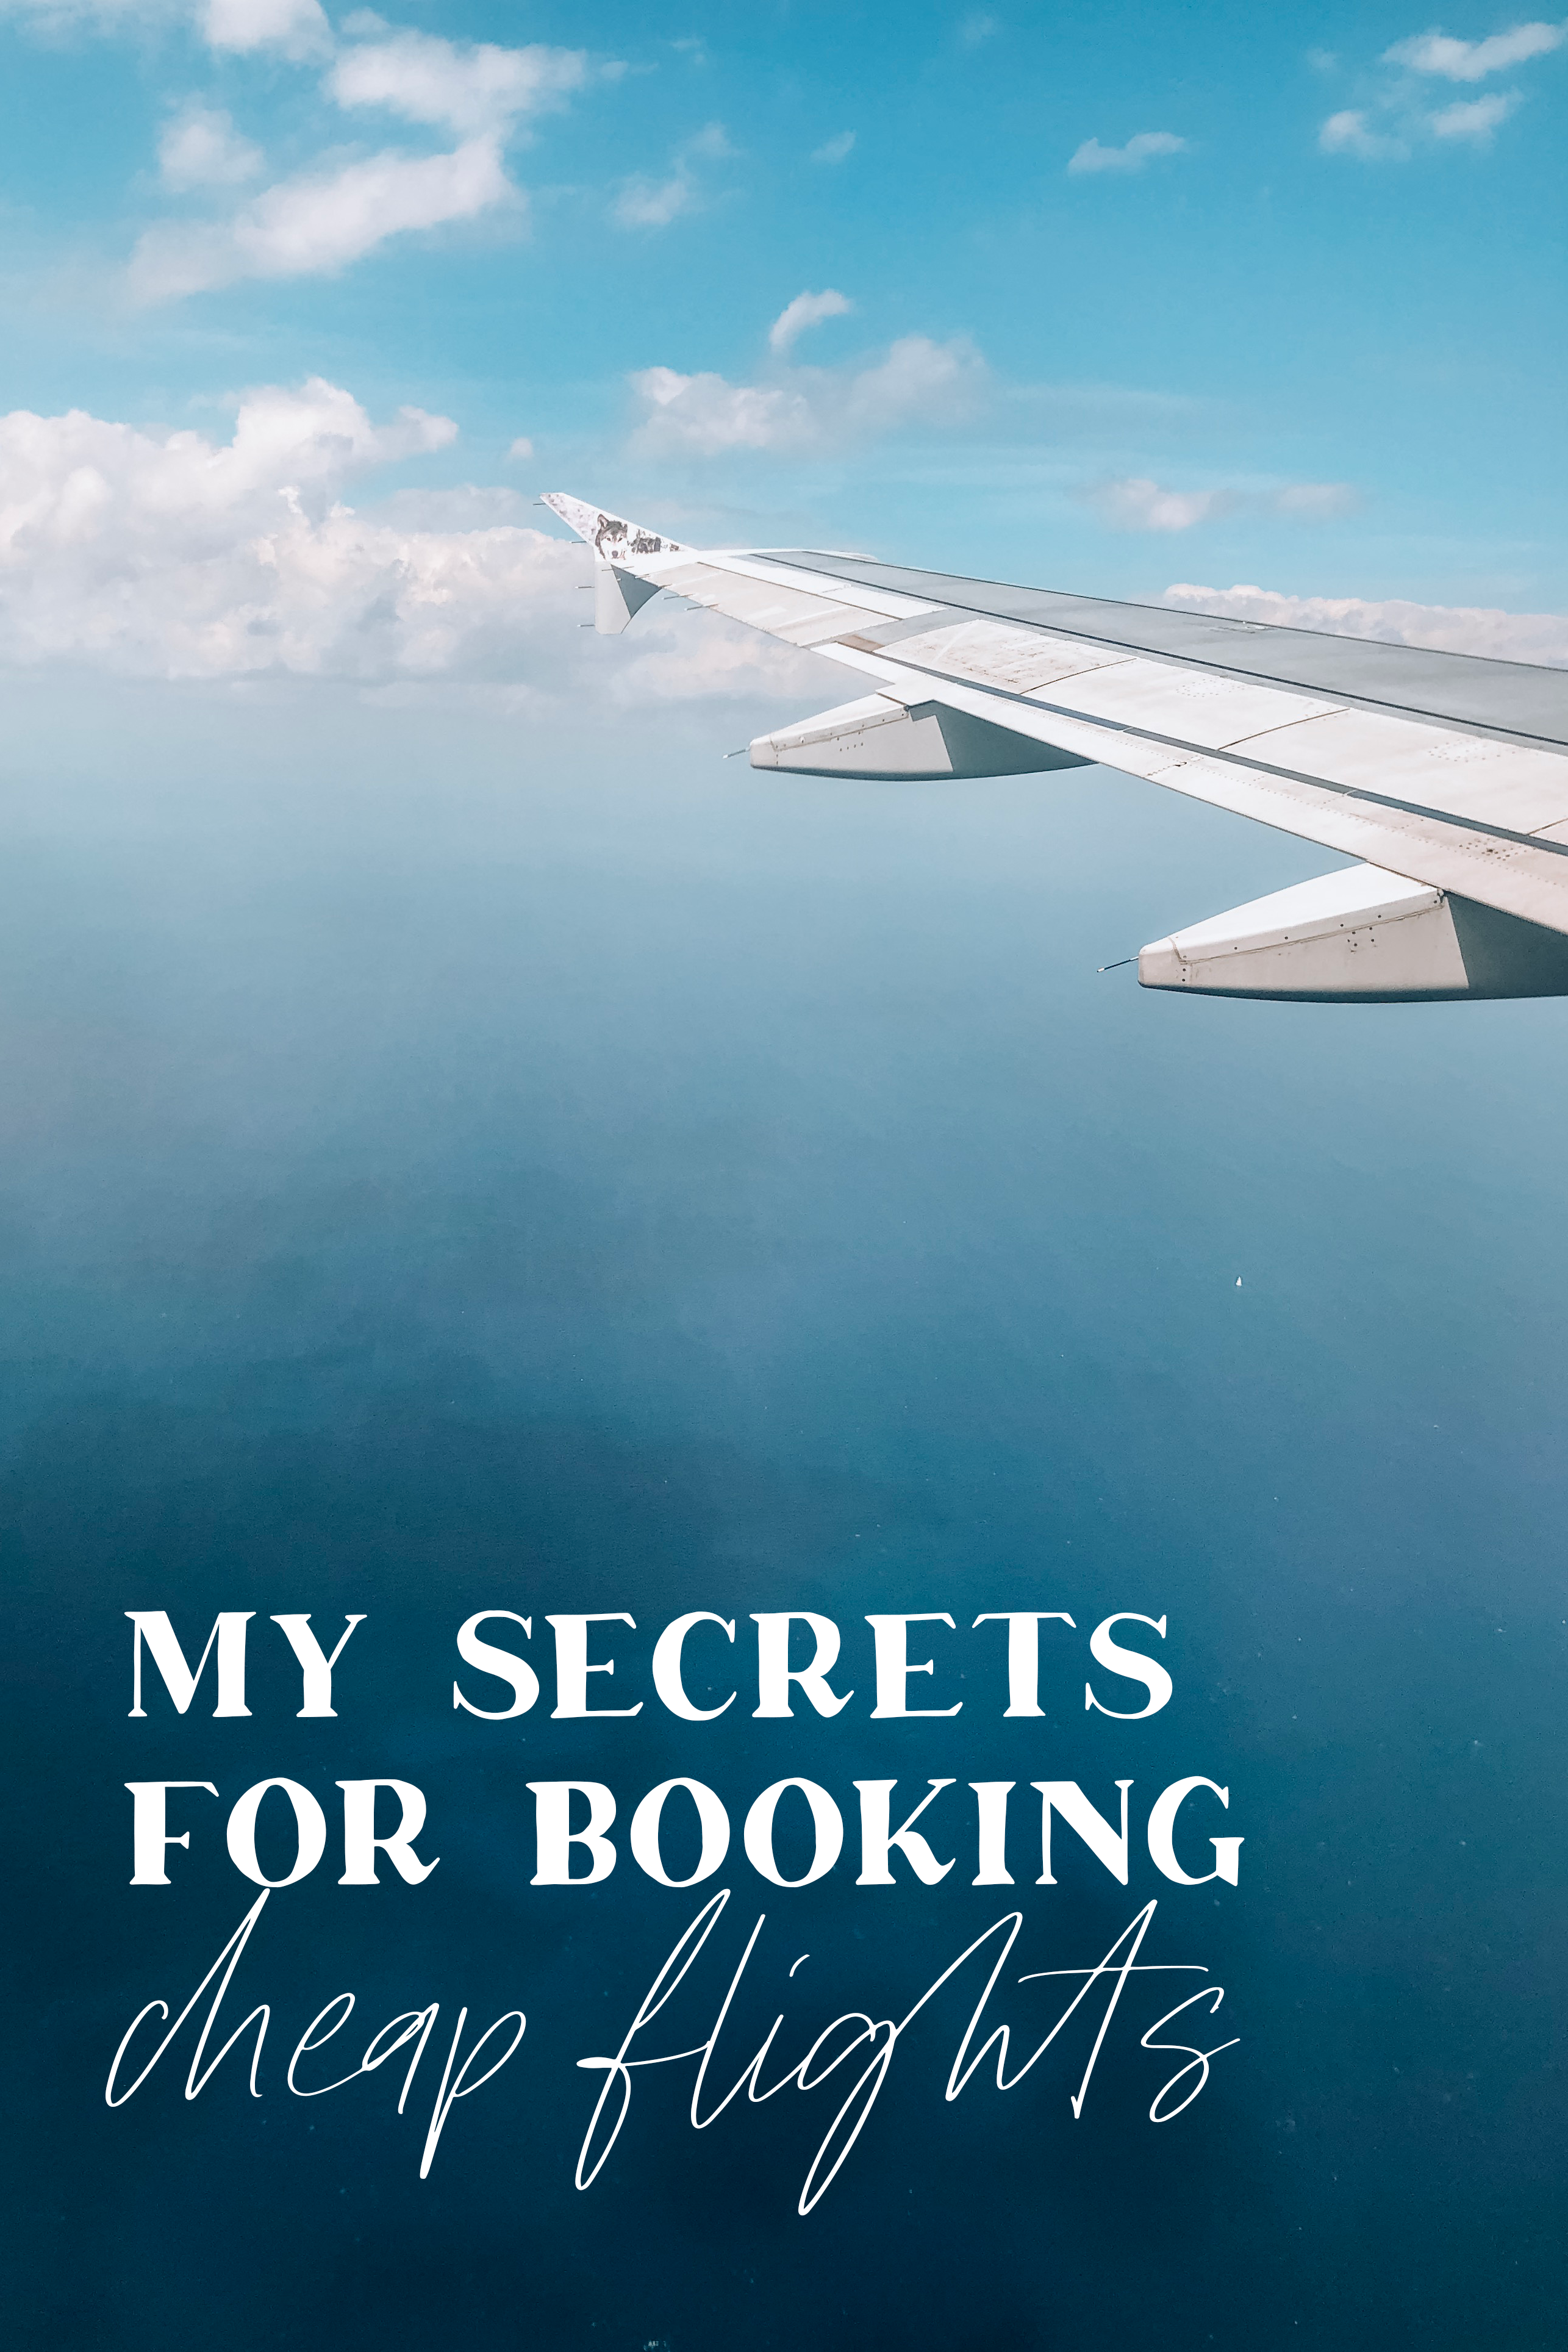 My secrets for booking cheap flights Andrea Vehige